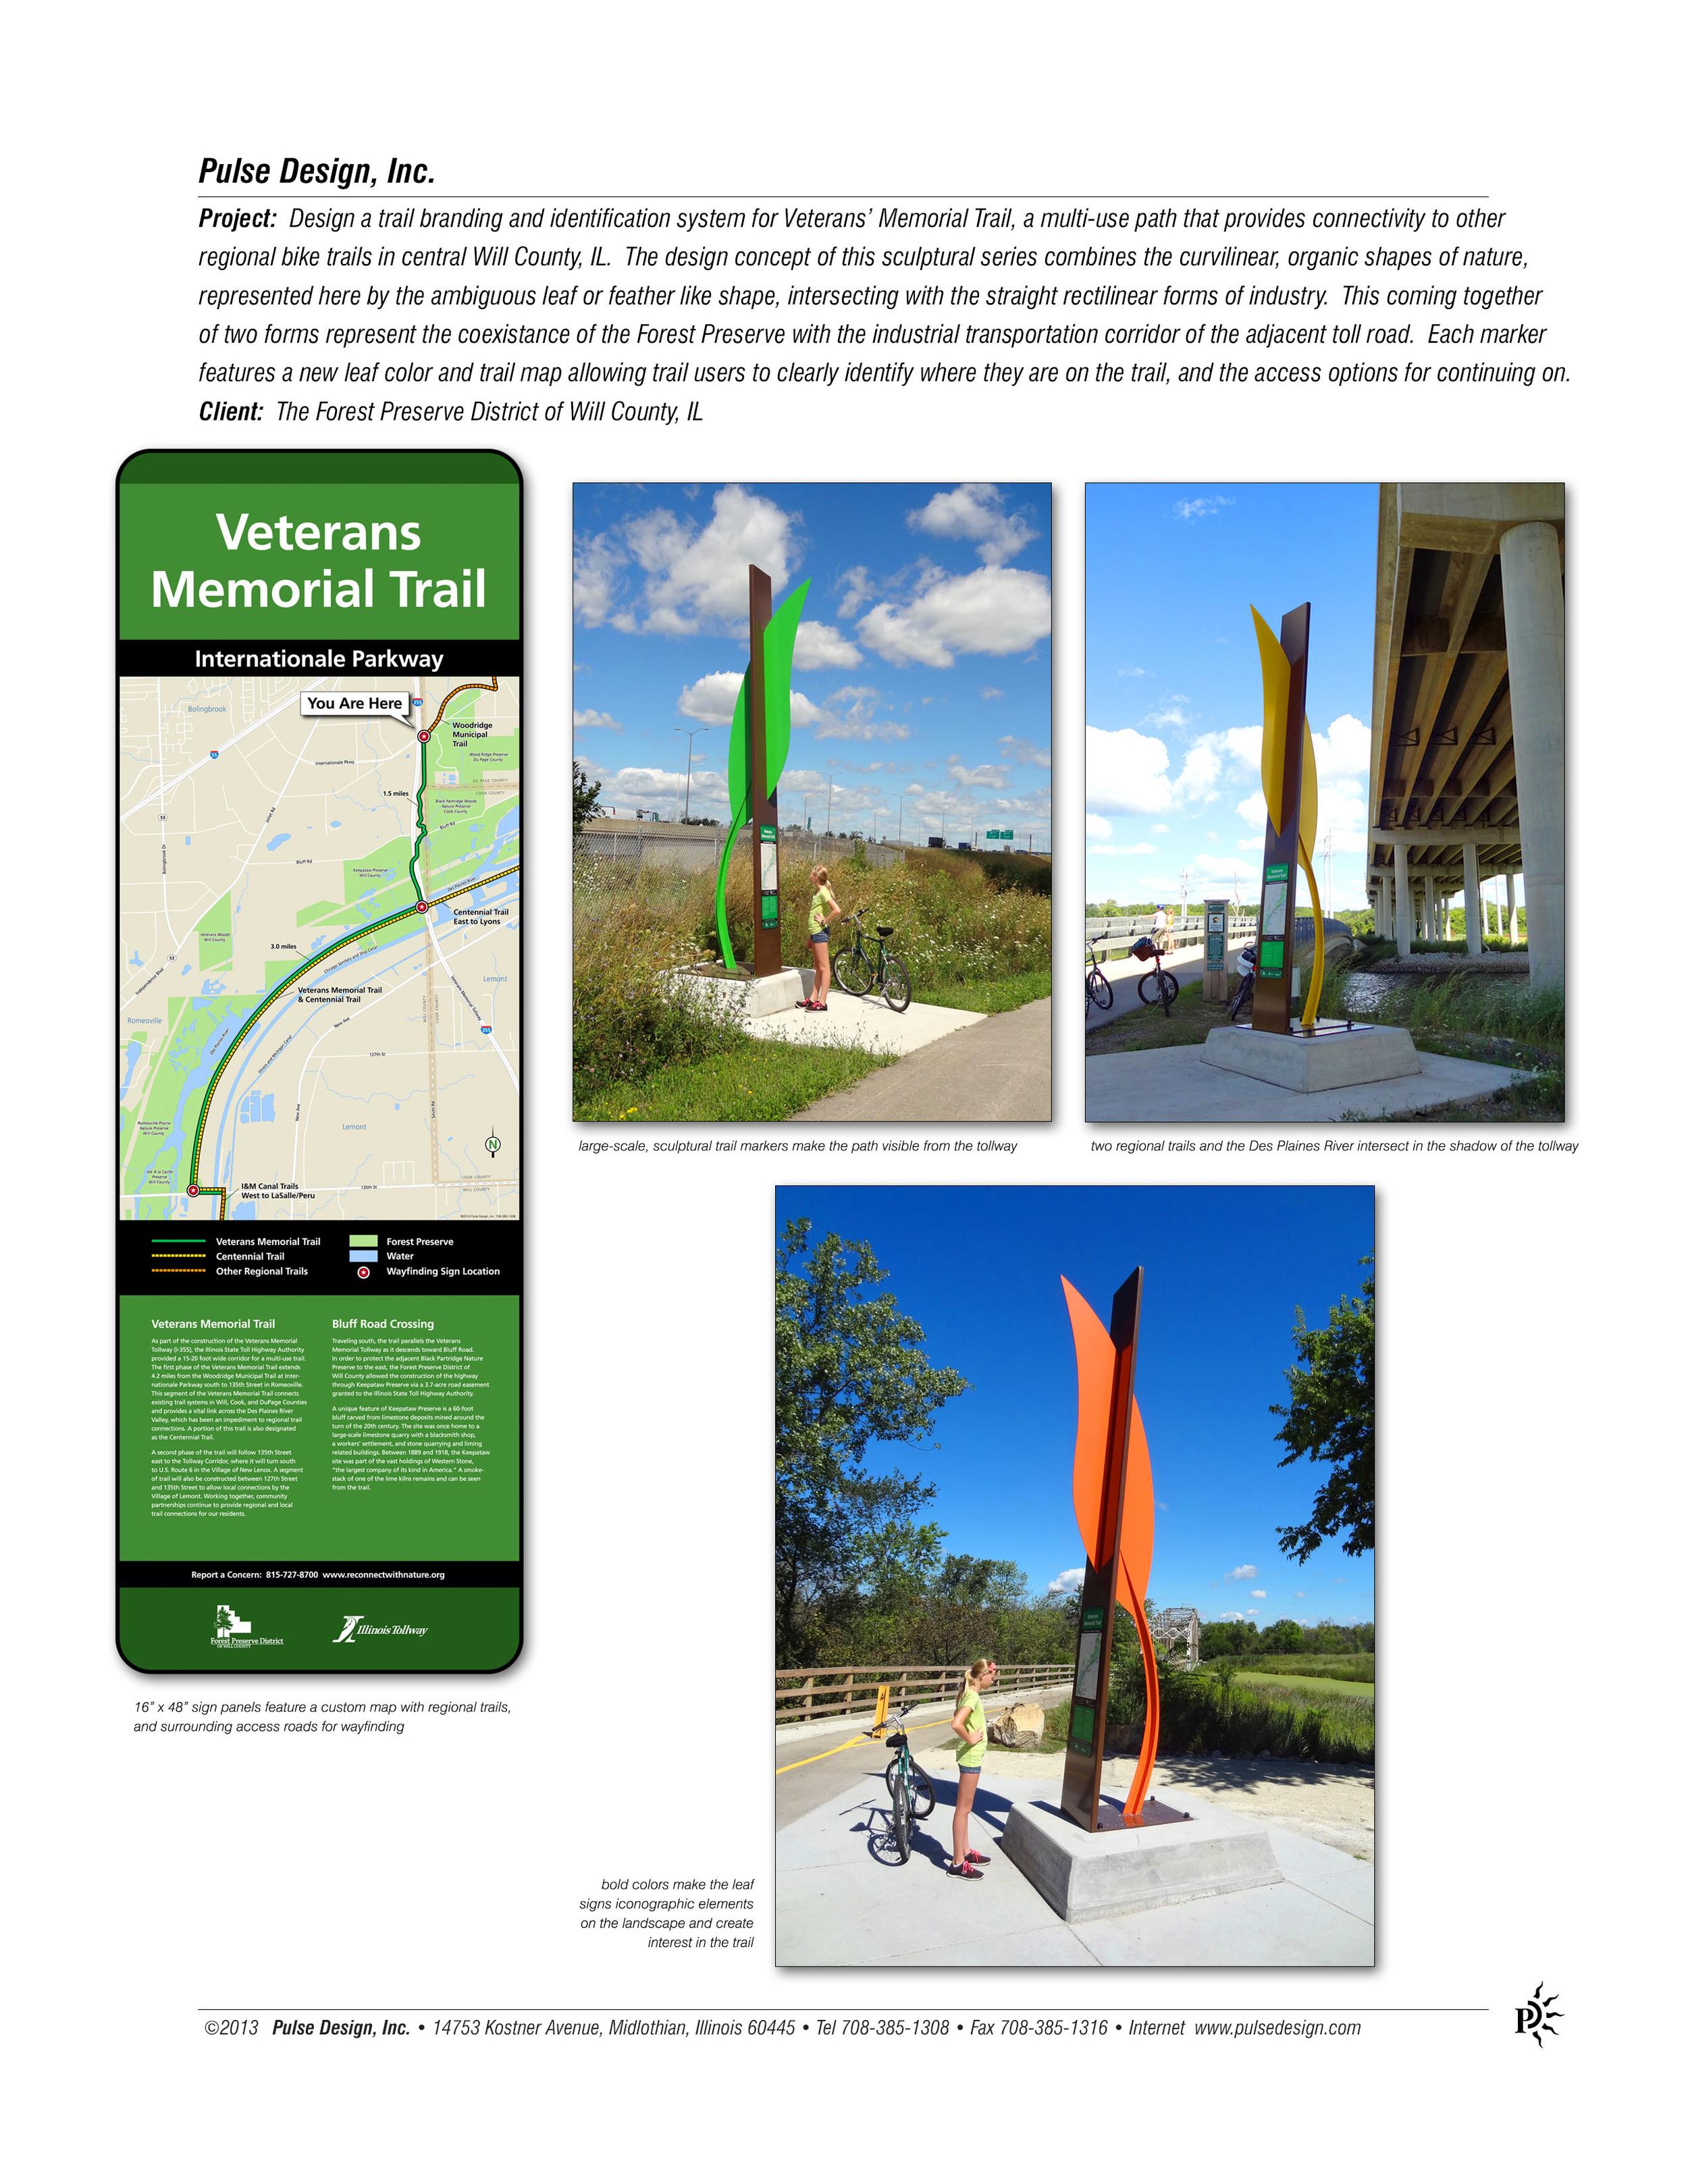 Veterans-Memorial-Trail-Sign-Photo-Multi-Pulse-Design-Inc.jpg